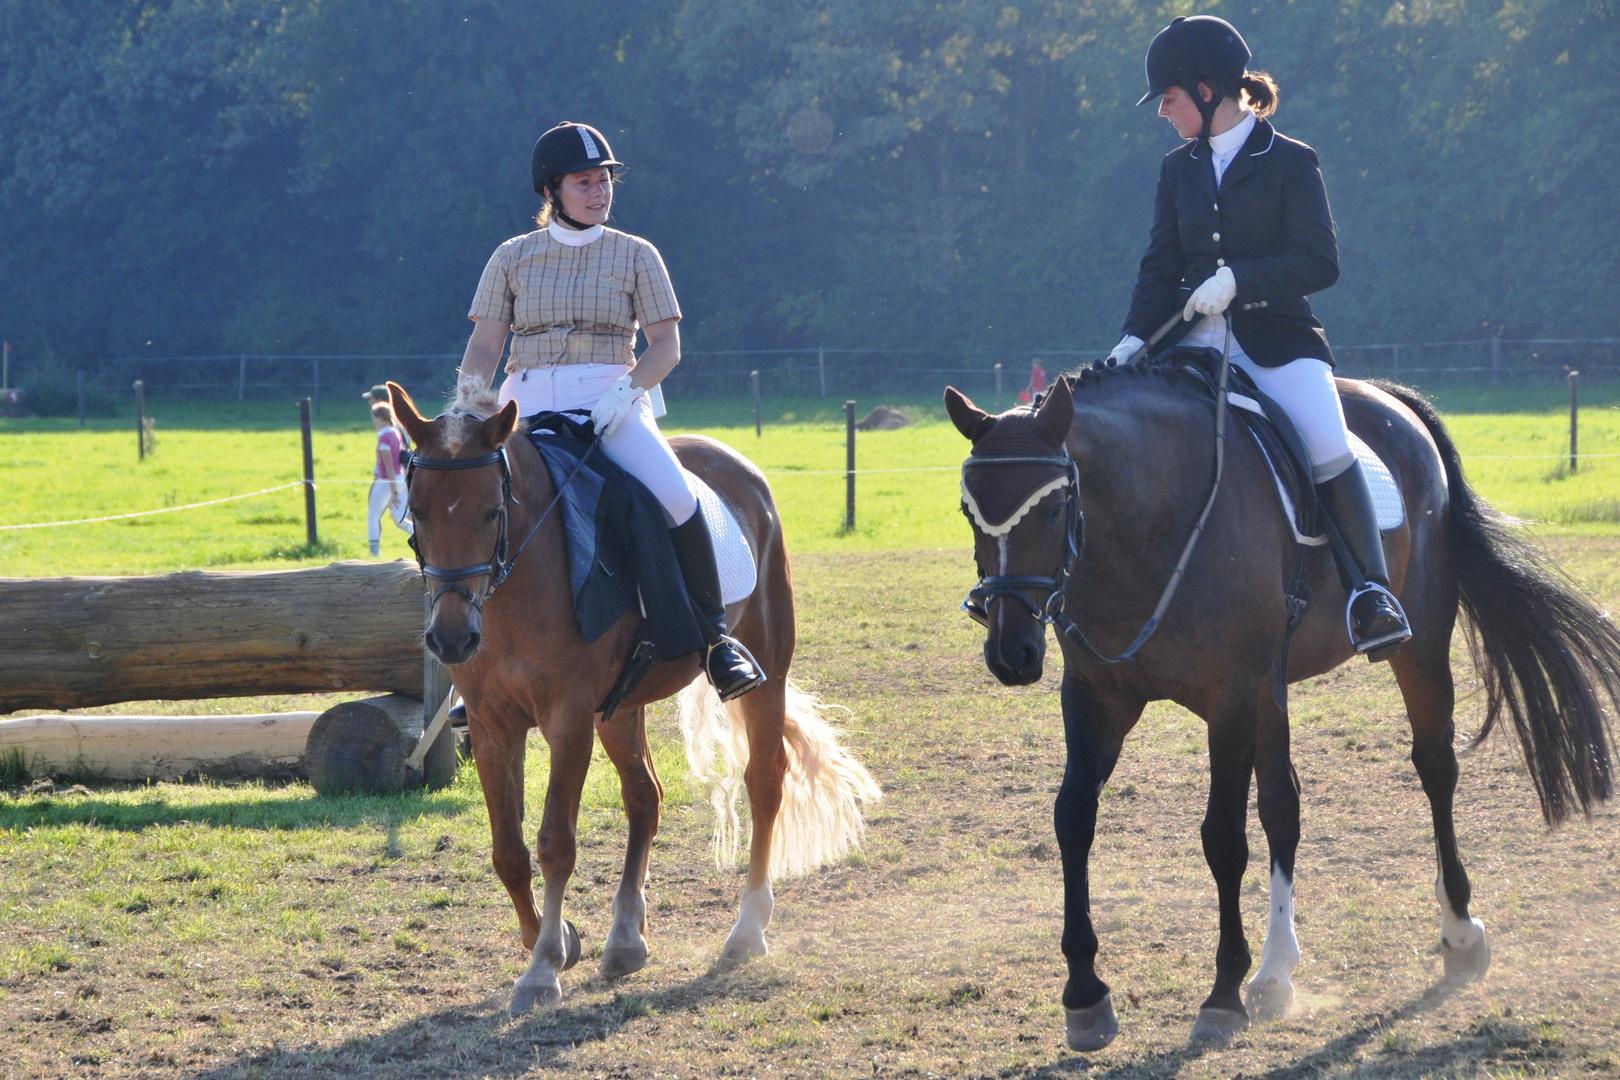 Reiterfreundschaft